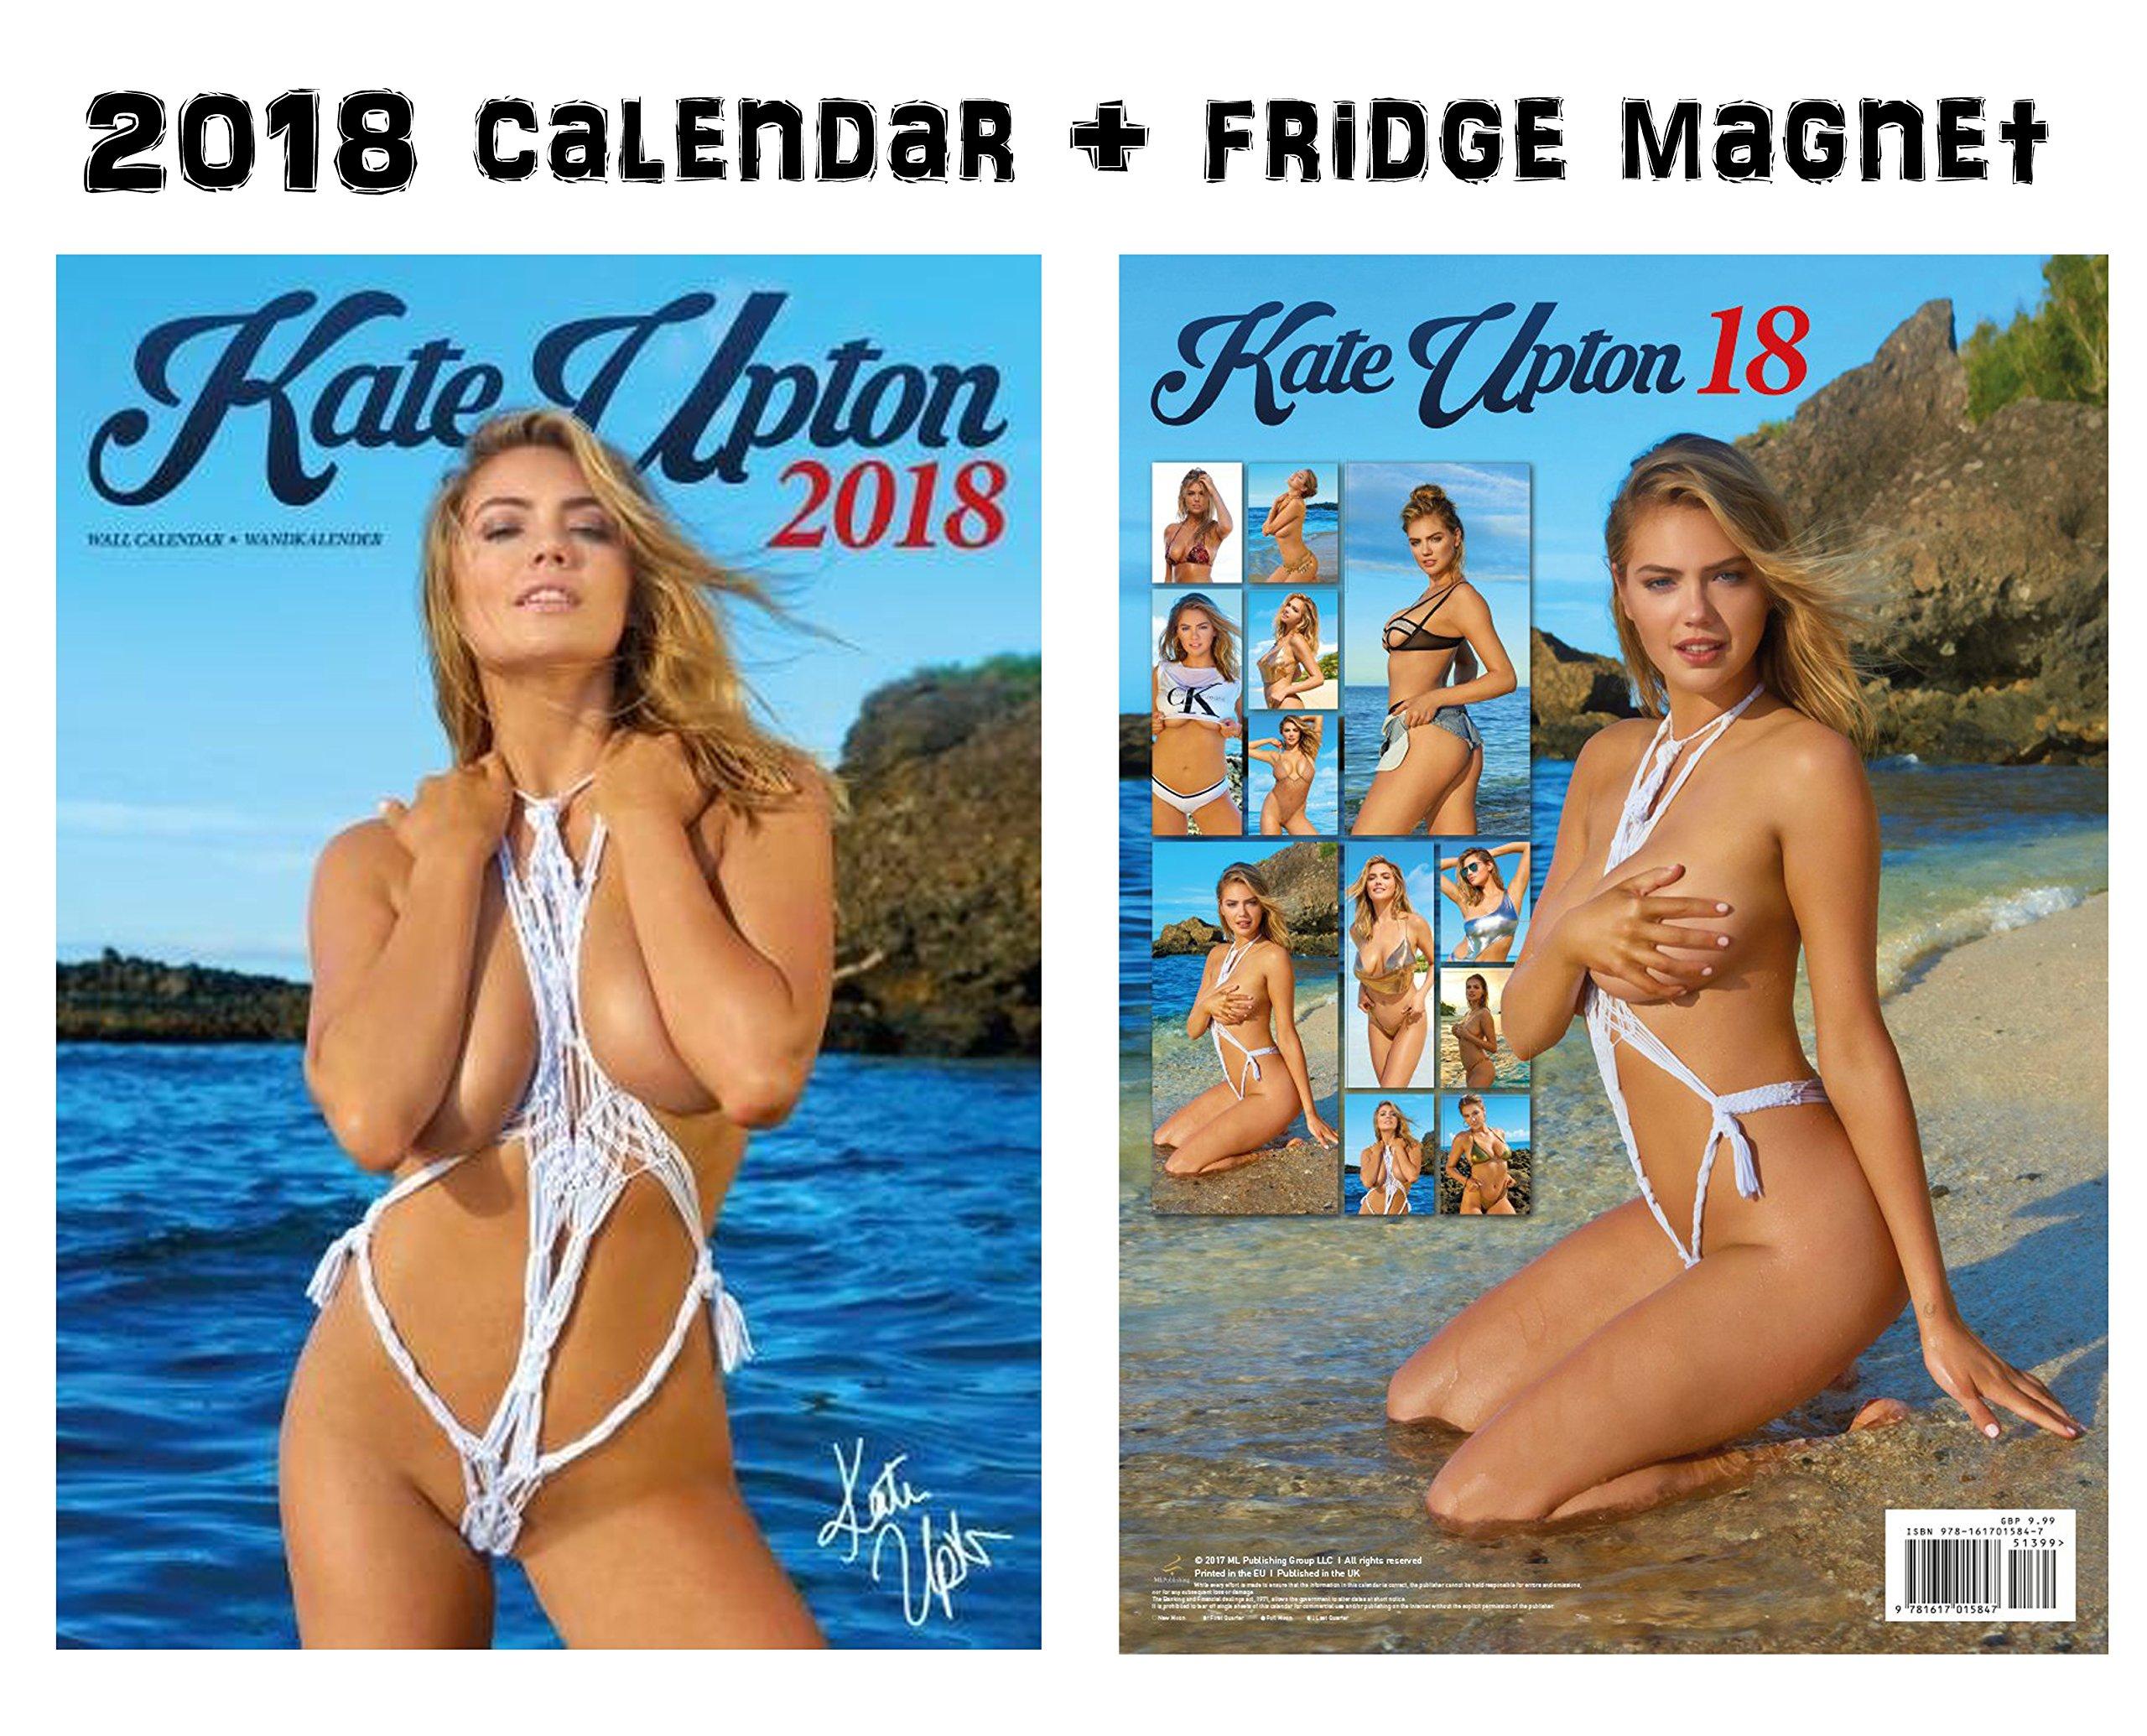 KATE UPTON 2018 CALENDAR + KATE UPTON FRIDGE MAGNET by ML PUBLISHING GROUP LLC